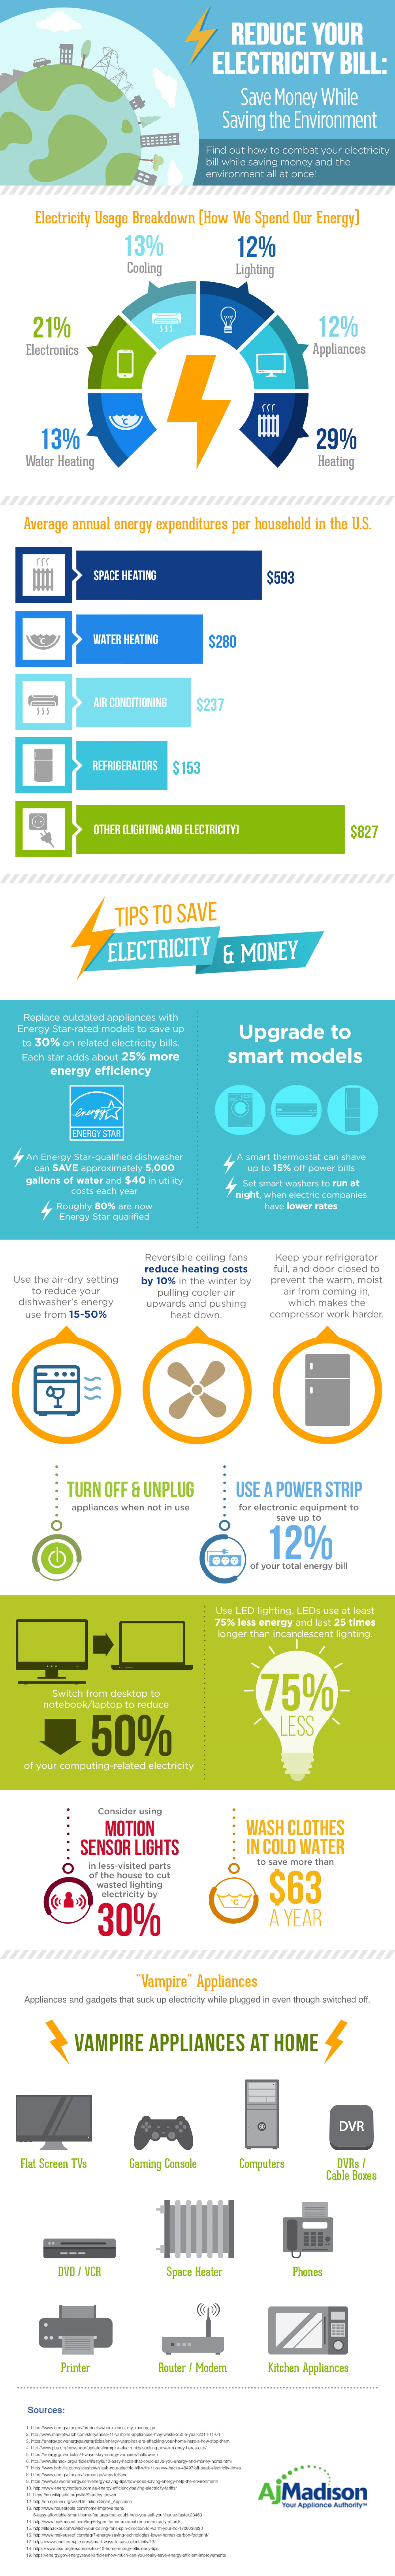 1st Light Energy | The 12+ Best Money-Saving Energy Hacks to